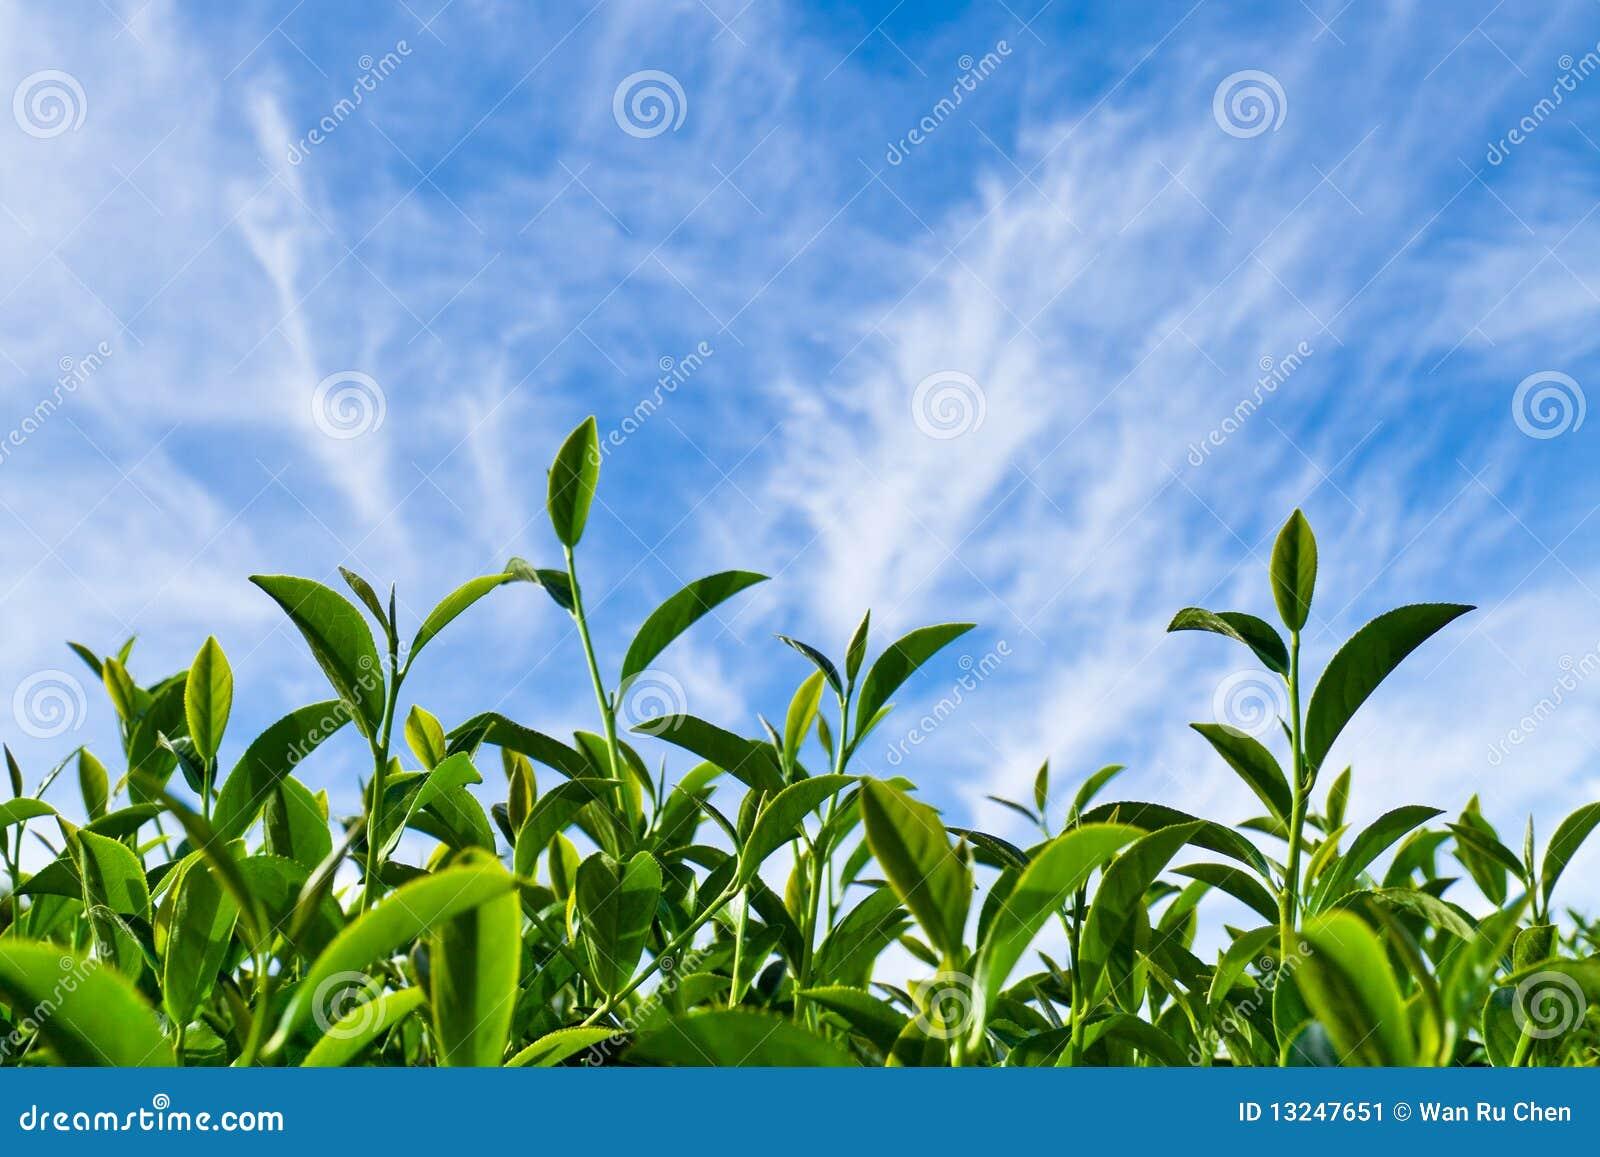 Tea Leaf As Blue Sky Stock Image - Image: 13247651